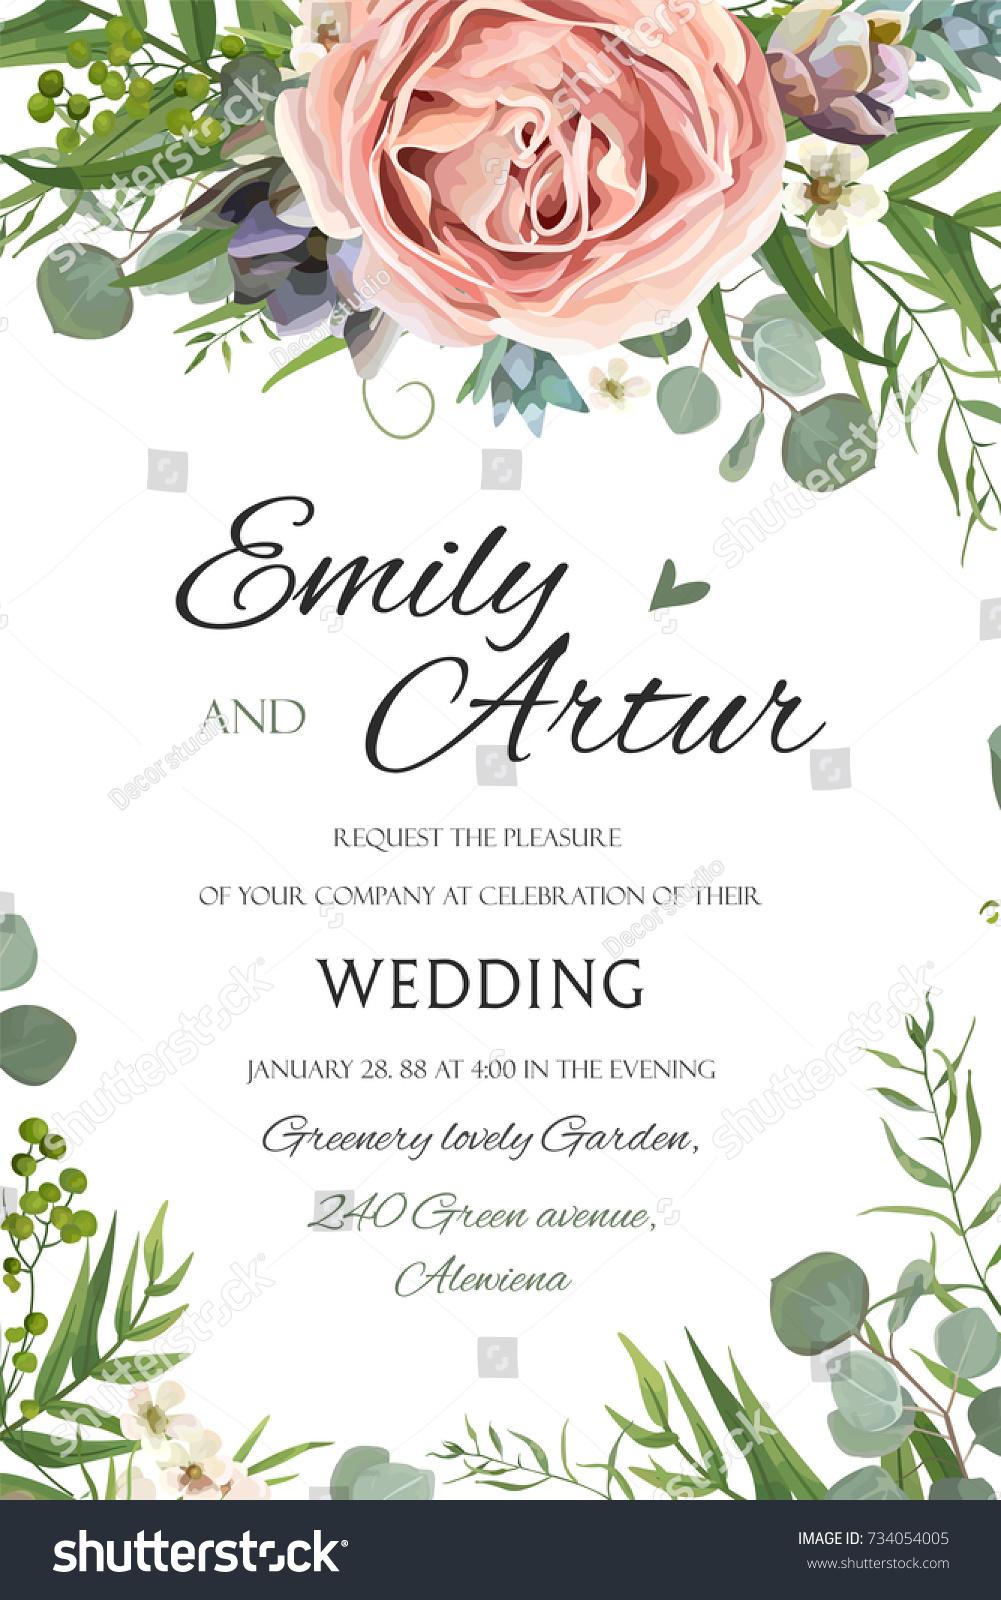 Wedding Invitation Invite Save Date Floral Image vectorielle de ...